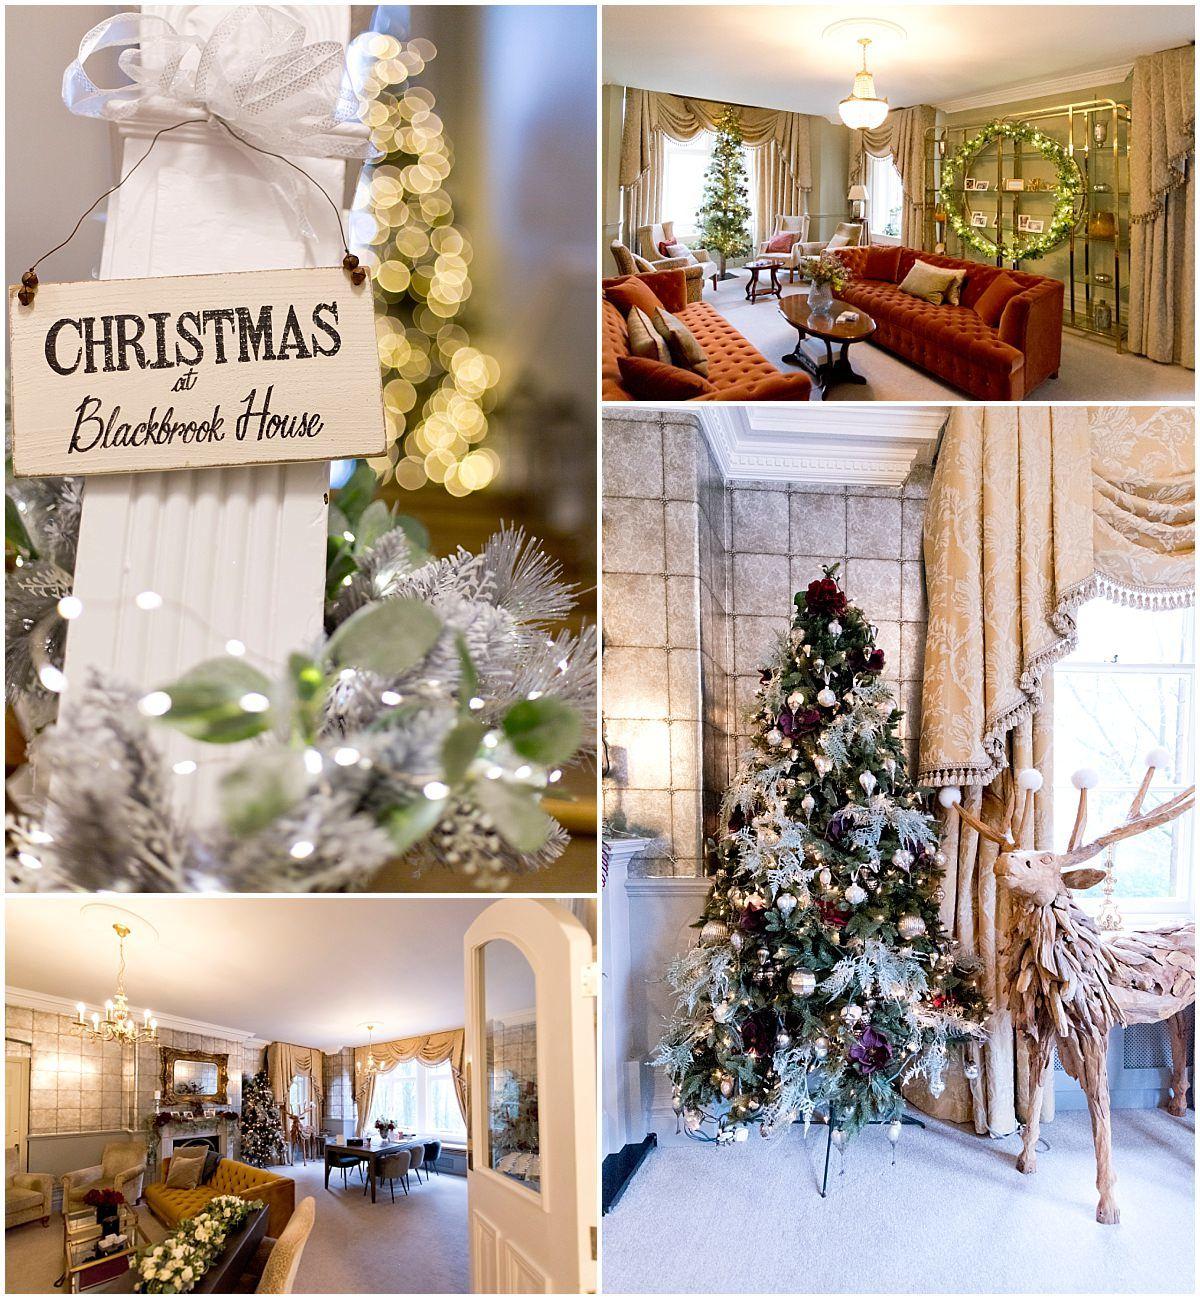 Wedding at Blackbrook House interior details